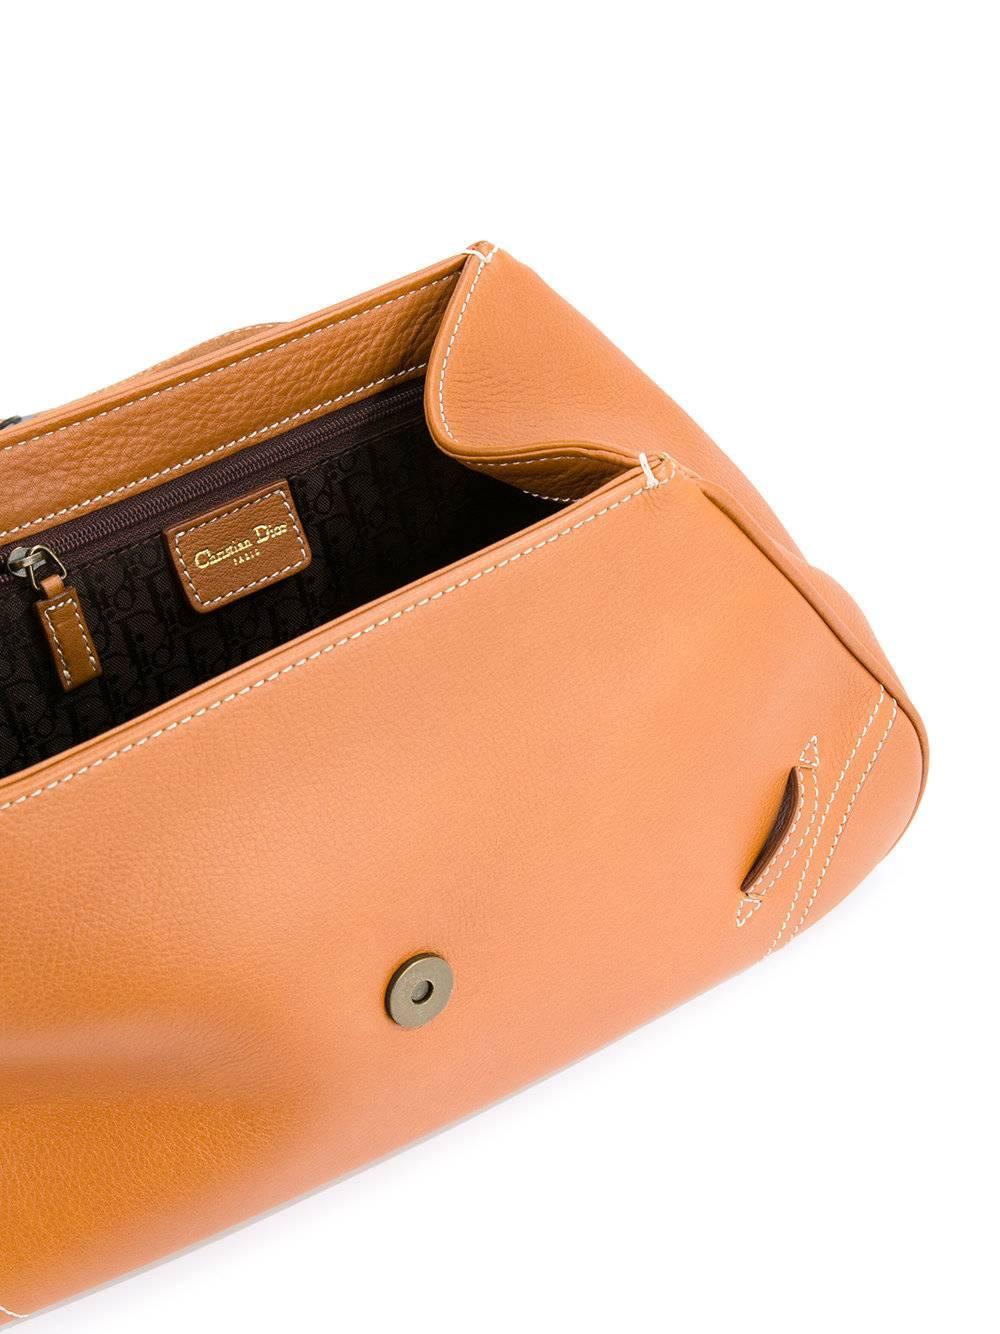 Dior Cognac Leather Gold Charm Top Handle Satchel Flap Shoulder Bag fT1wJLrd